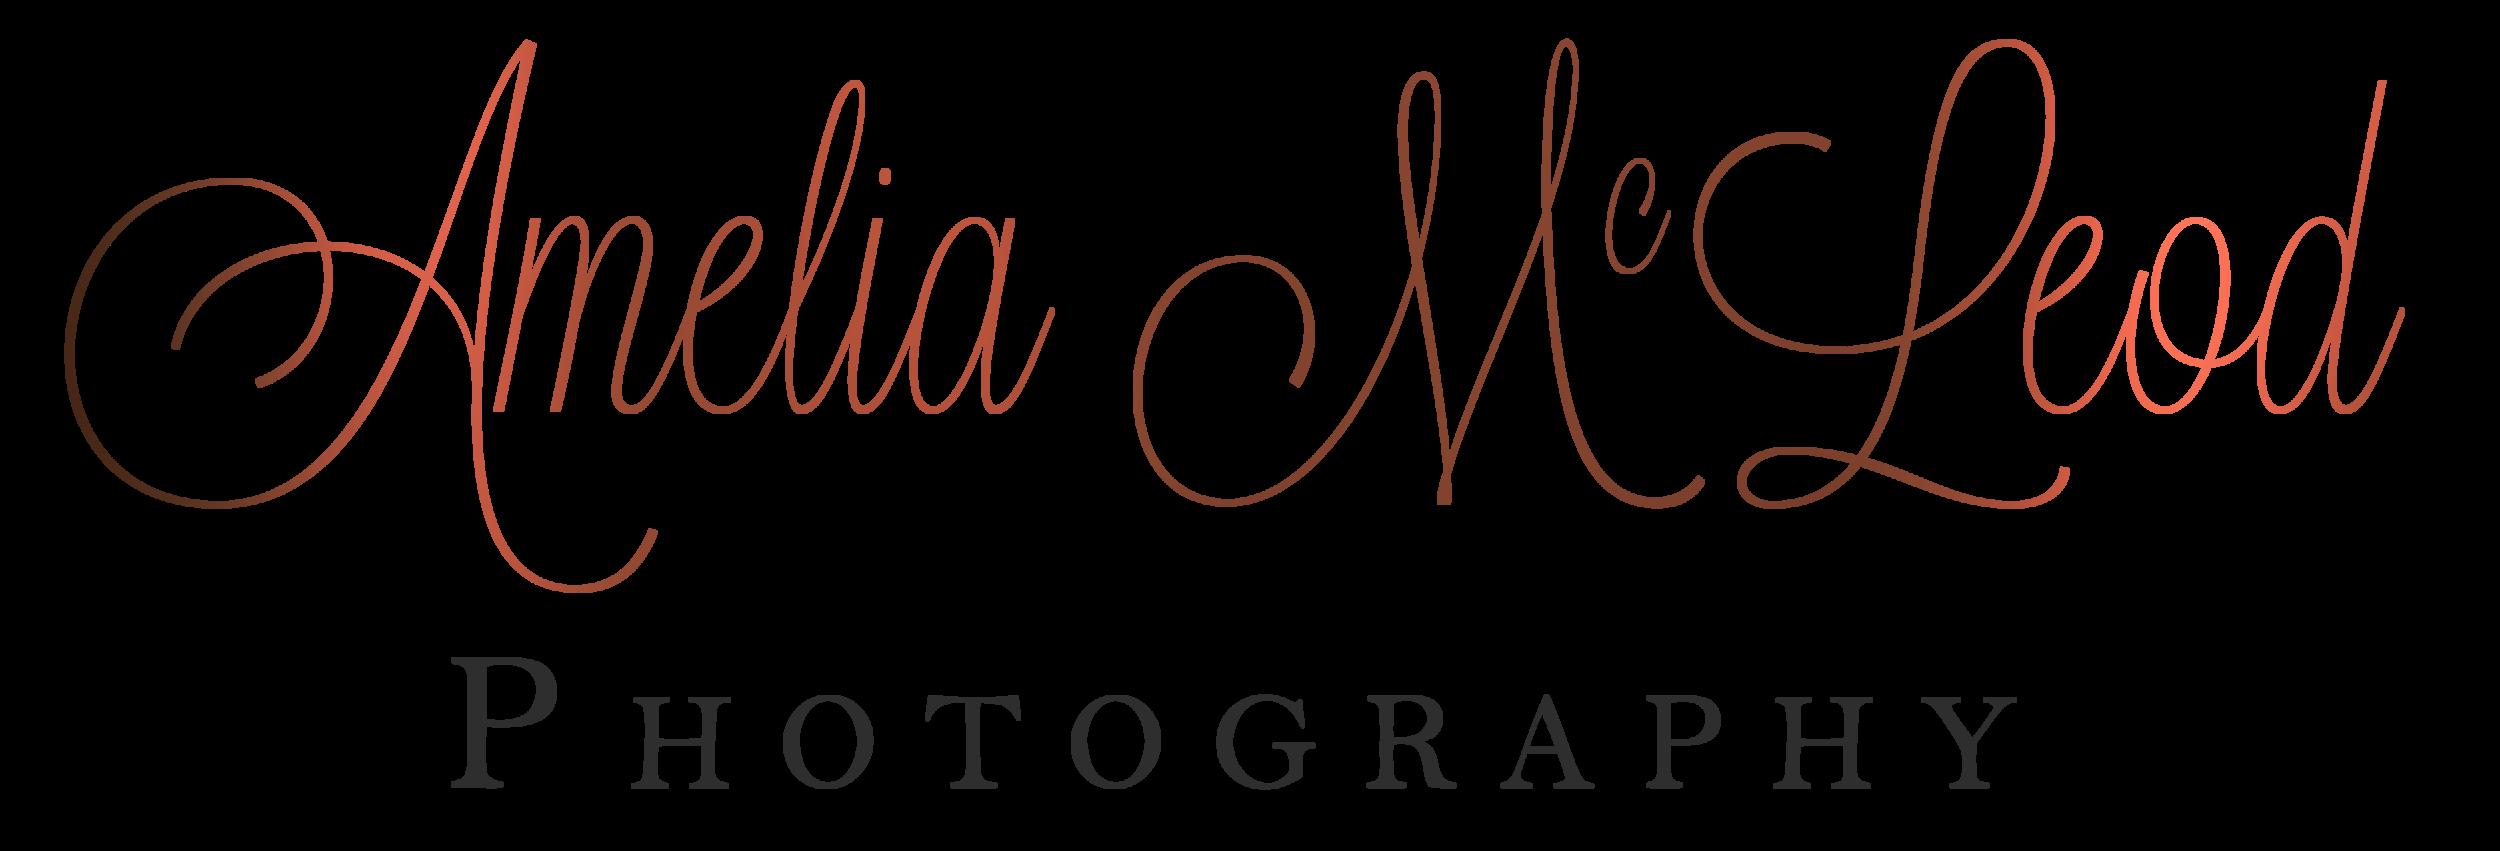 Amelia McLeod Photography logo light background.png